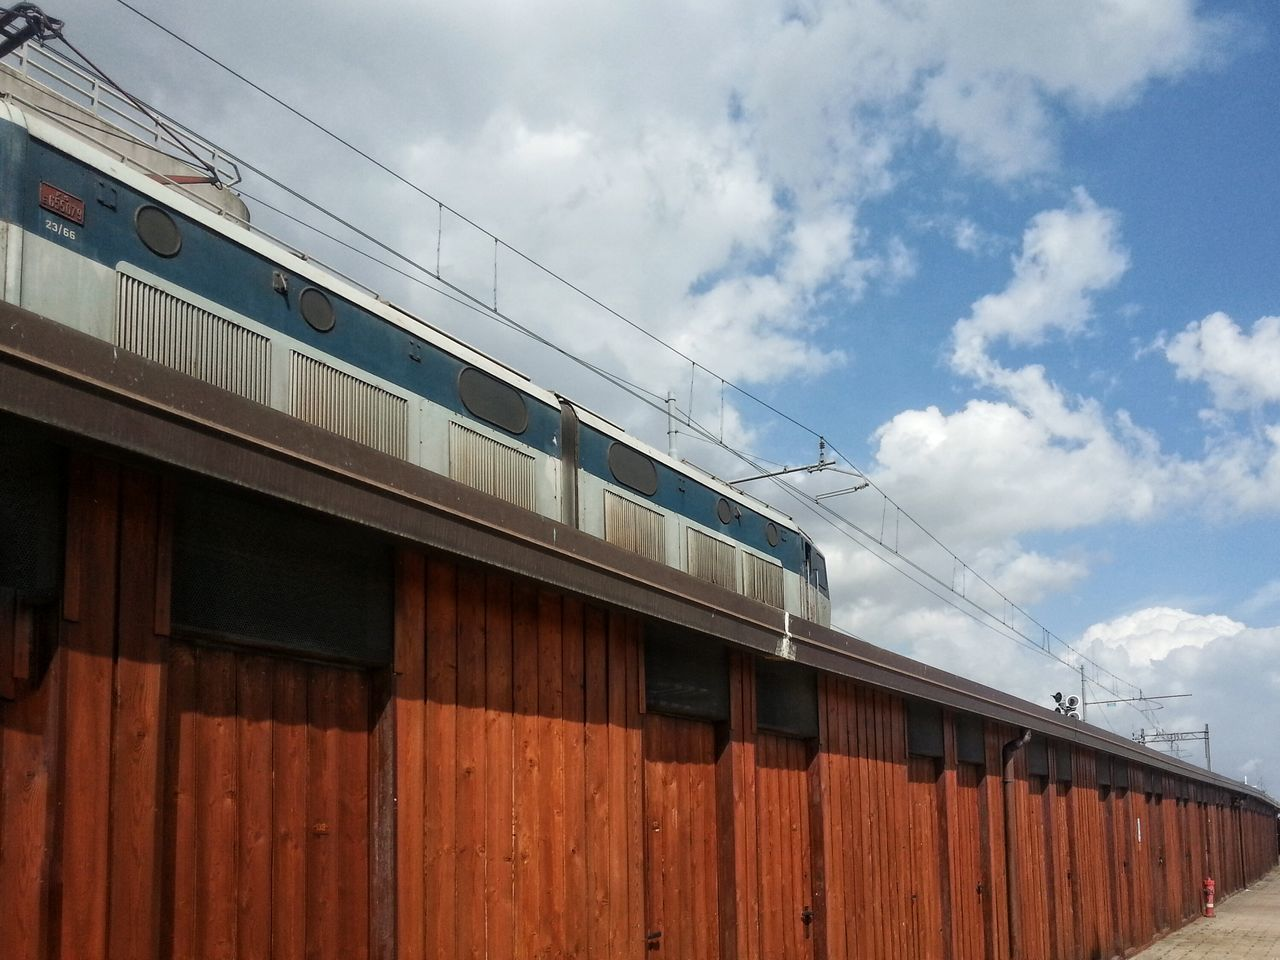 Beautiful stock photos of train,  Architecture,  Building Exterior,  Built Structure,  Cloud - Sky